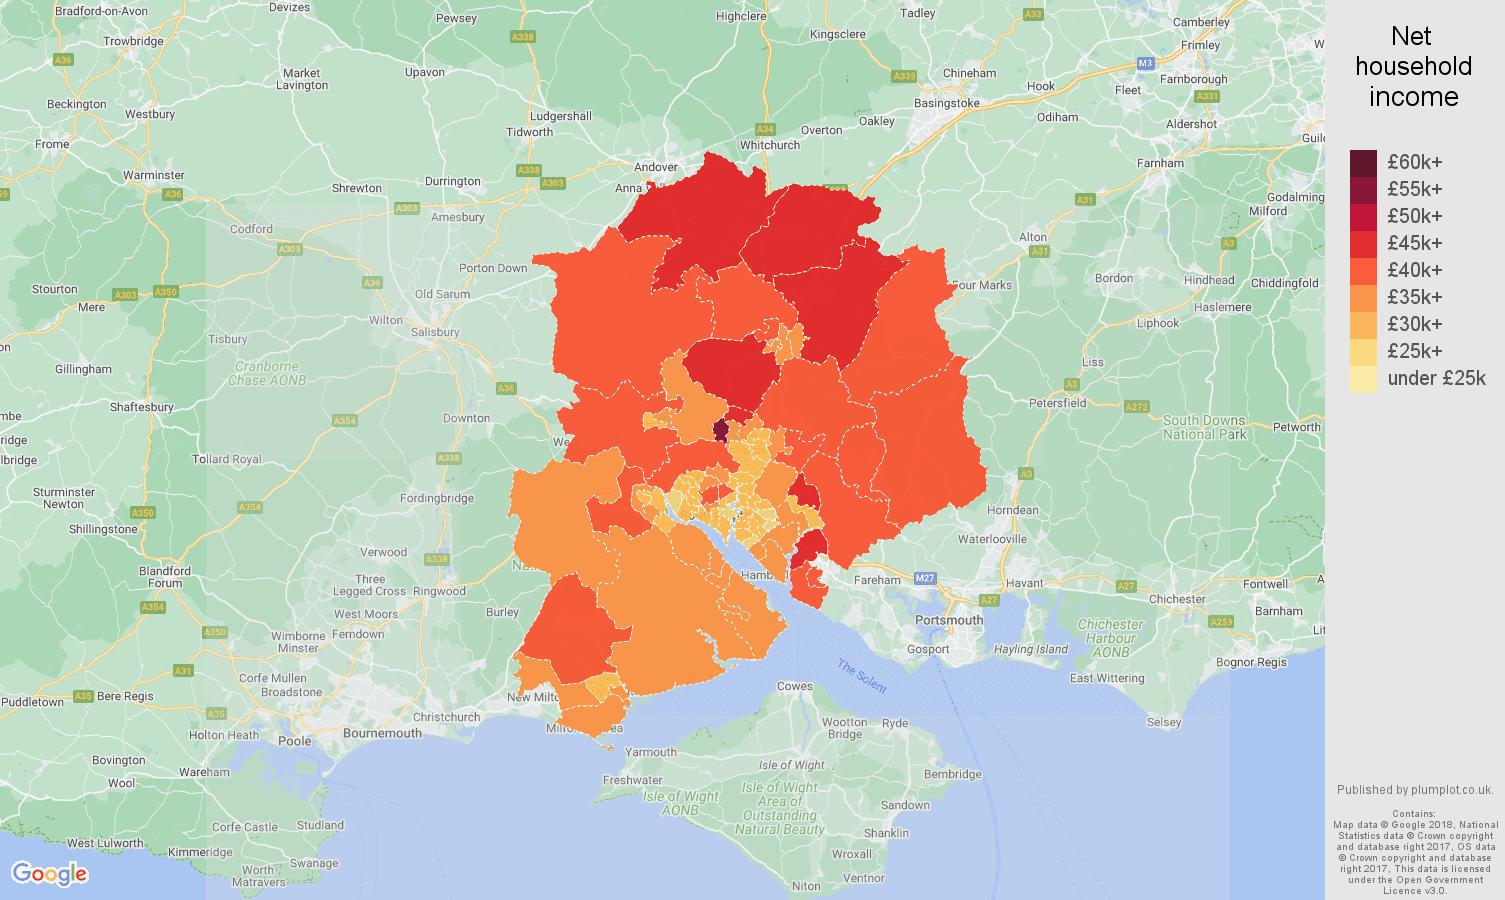 Southampton net household income map